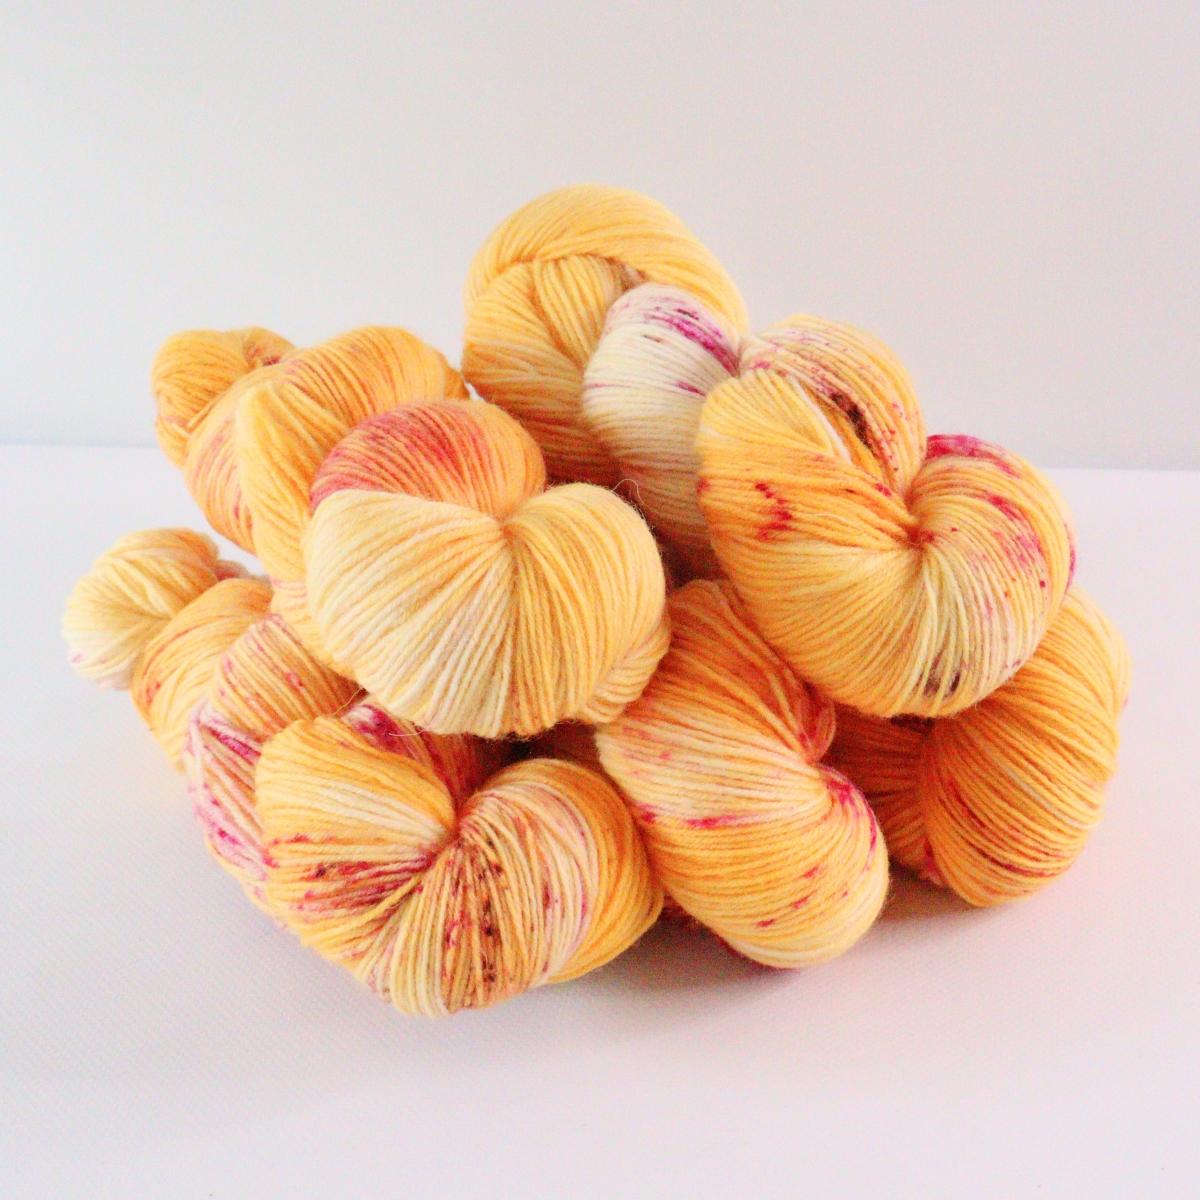 woodico.pro hand dyed yarn 077 1200x1200 - Hand dyed yarn / 077